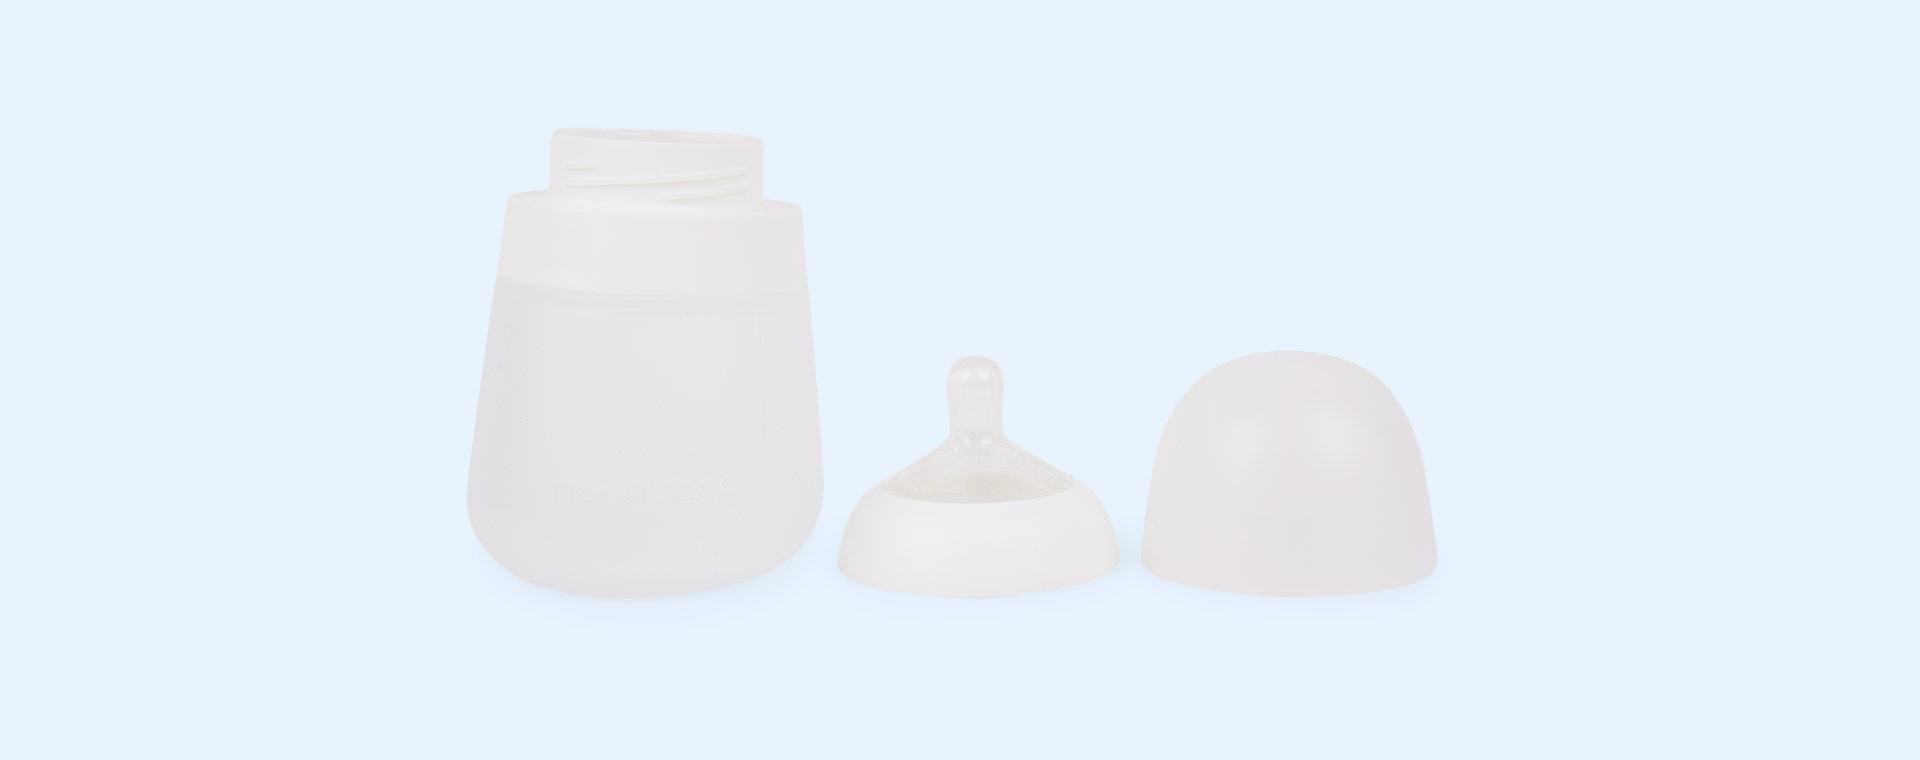 White nanobébé 2-Pack Flexy Silicone Baby Bottles